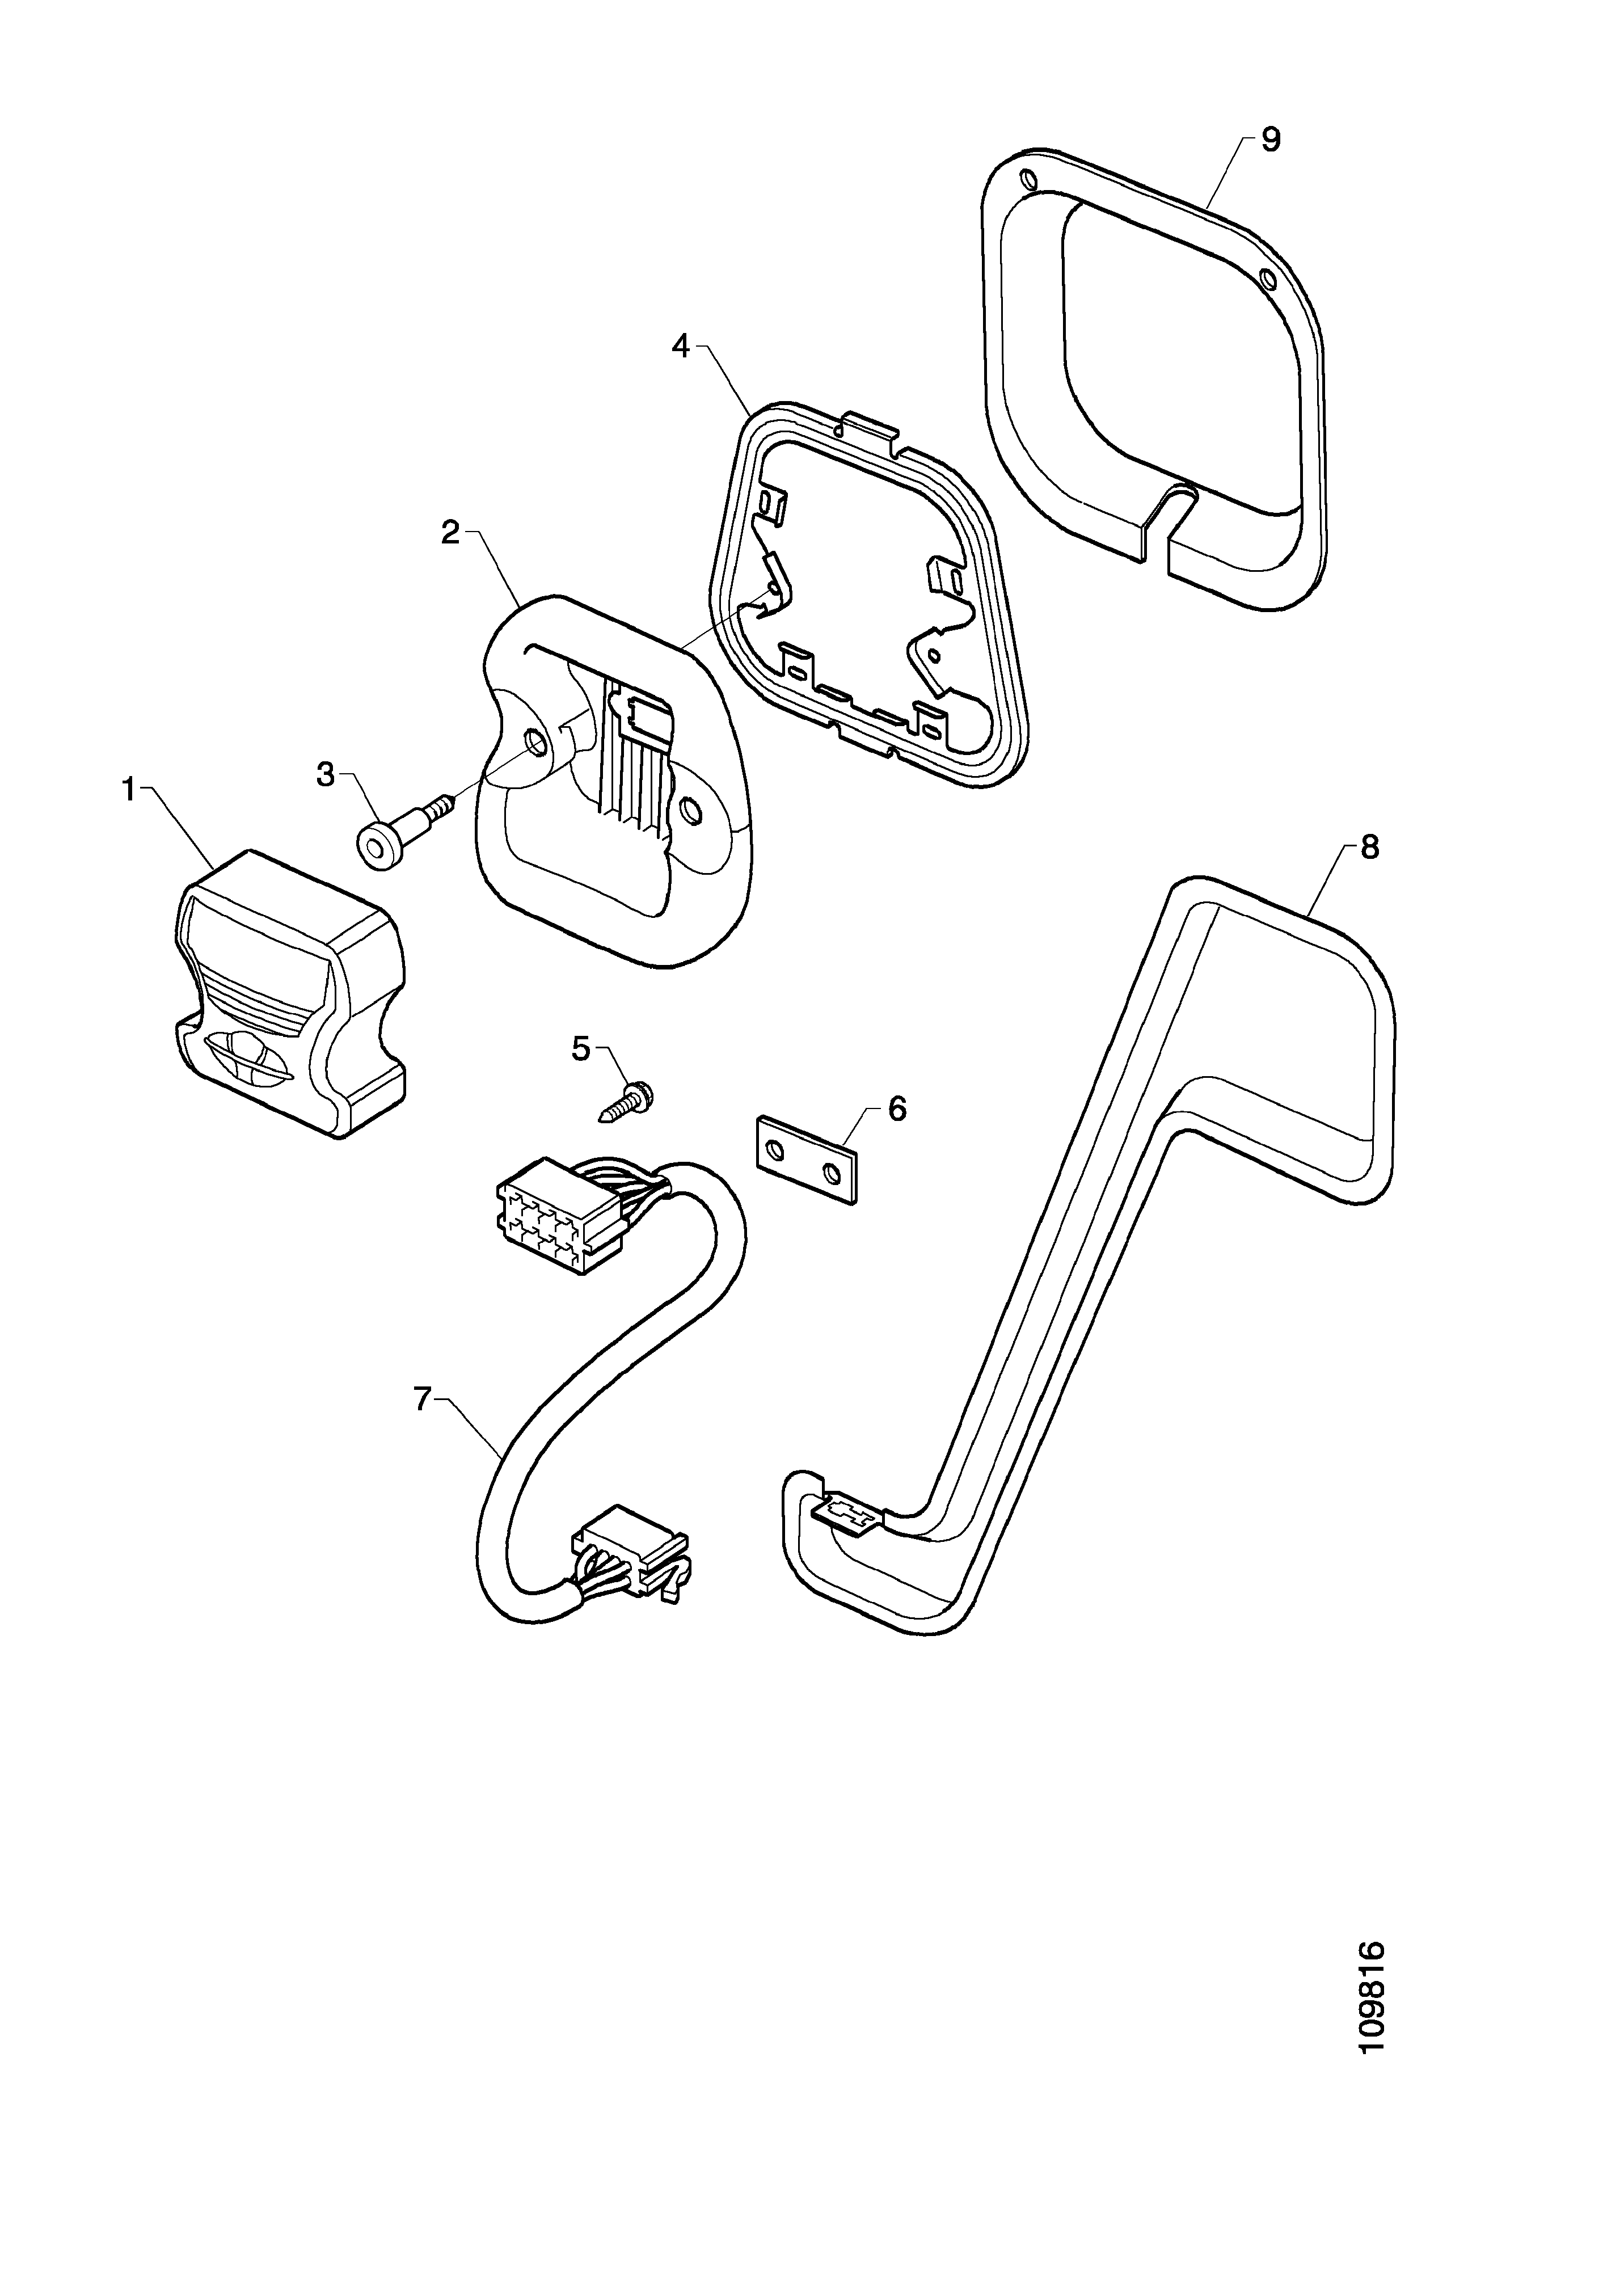 wls auto electrical wiring diagramDownload Free Circuit Diagram By Circuitdiagramcodeplexcom V2000 #16